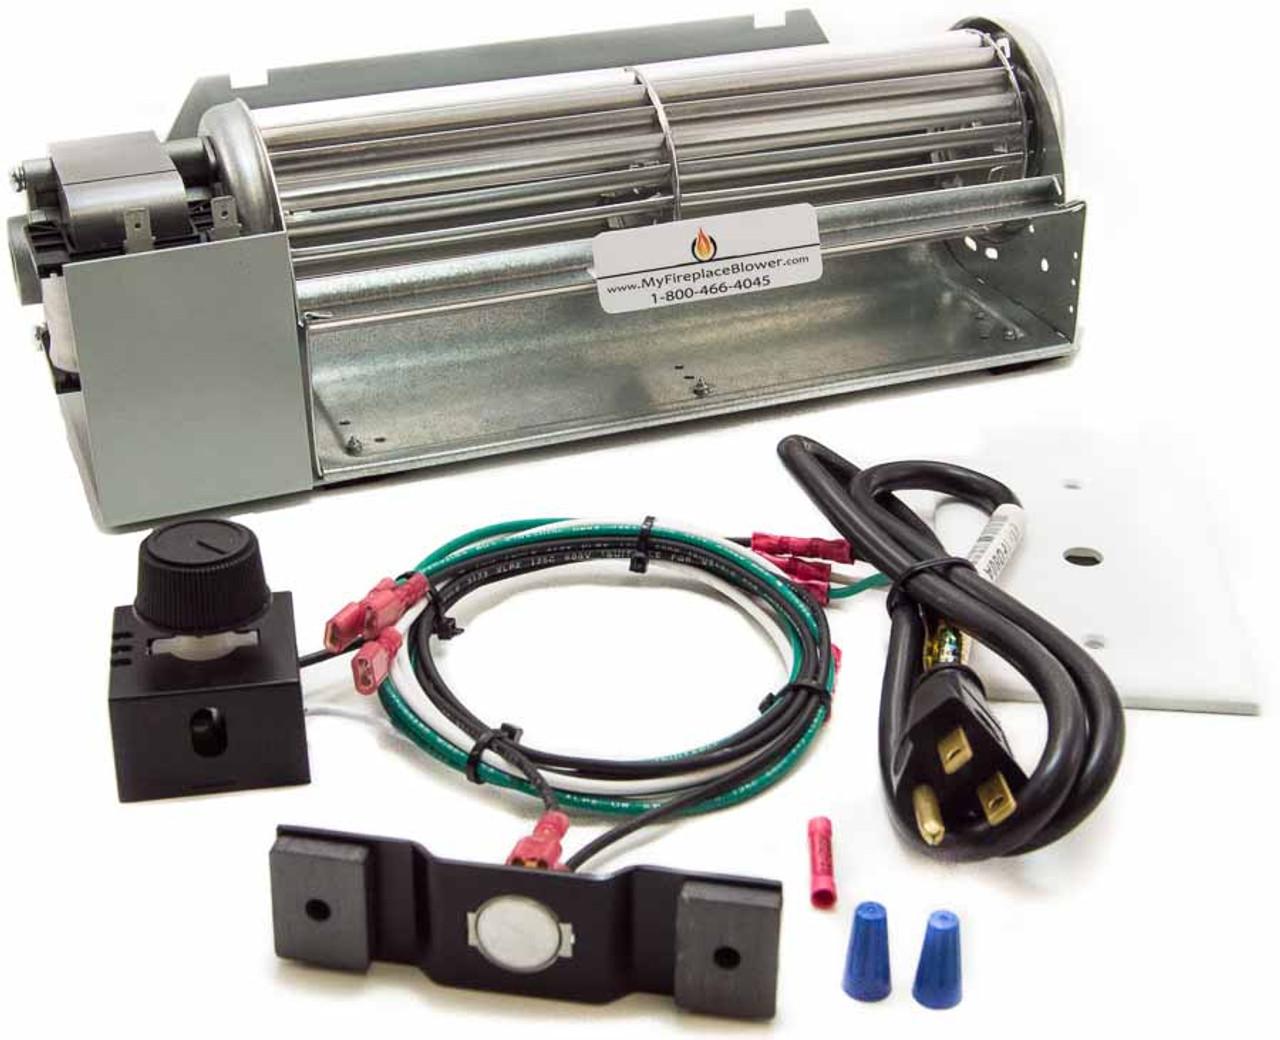 wood blower trgn k blowers woodstov universal on stove fans w tube heater kit fireplace spitfire